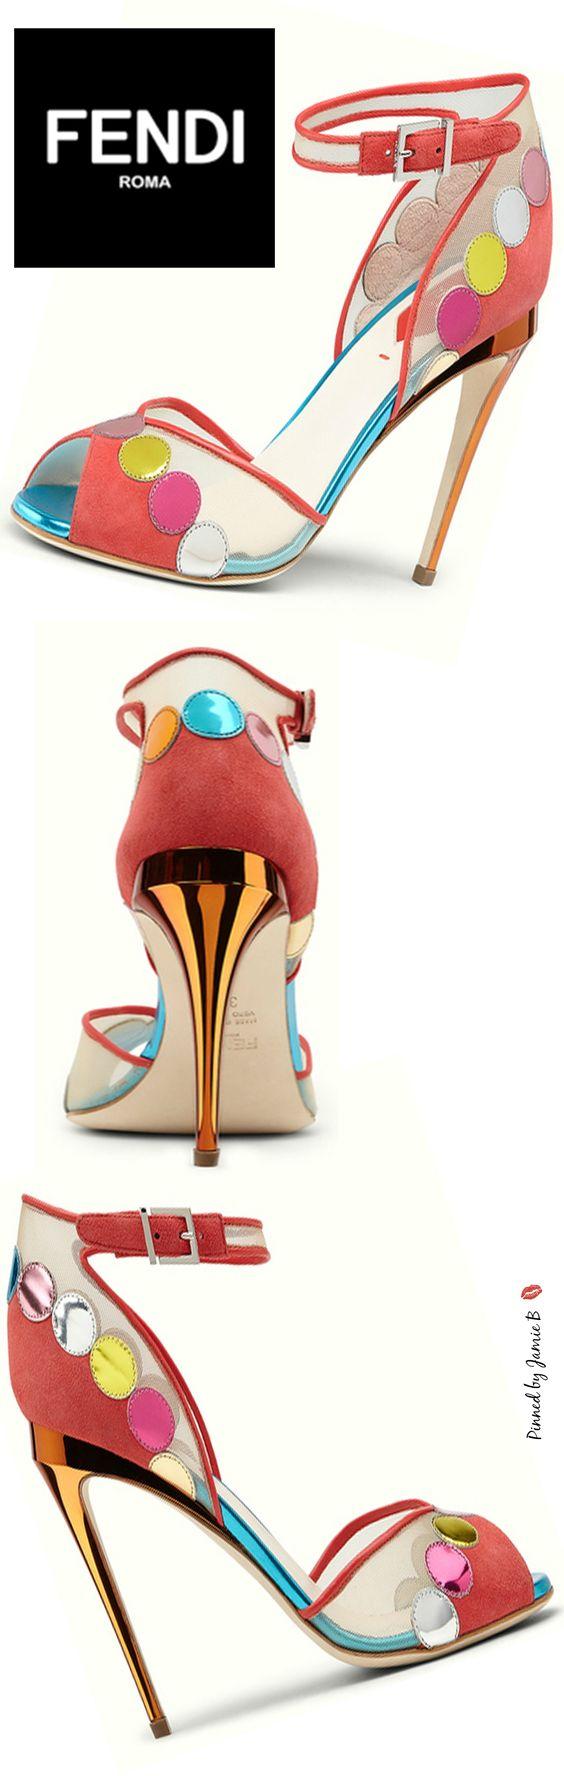 Fendi | Multi-Colour Sandals | shoes 1 Yasemin Aksu